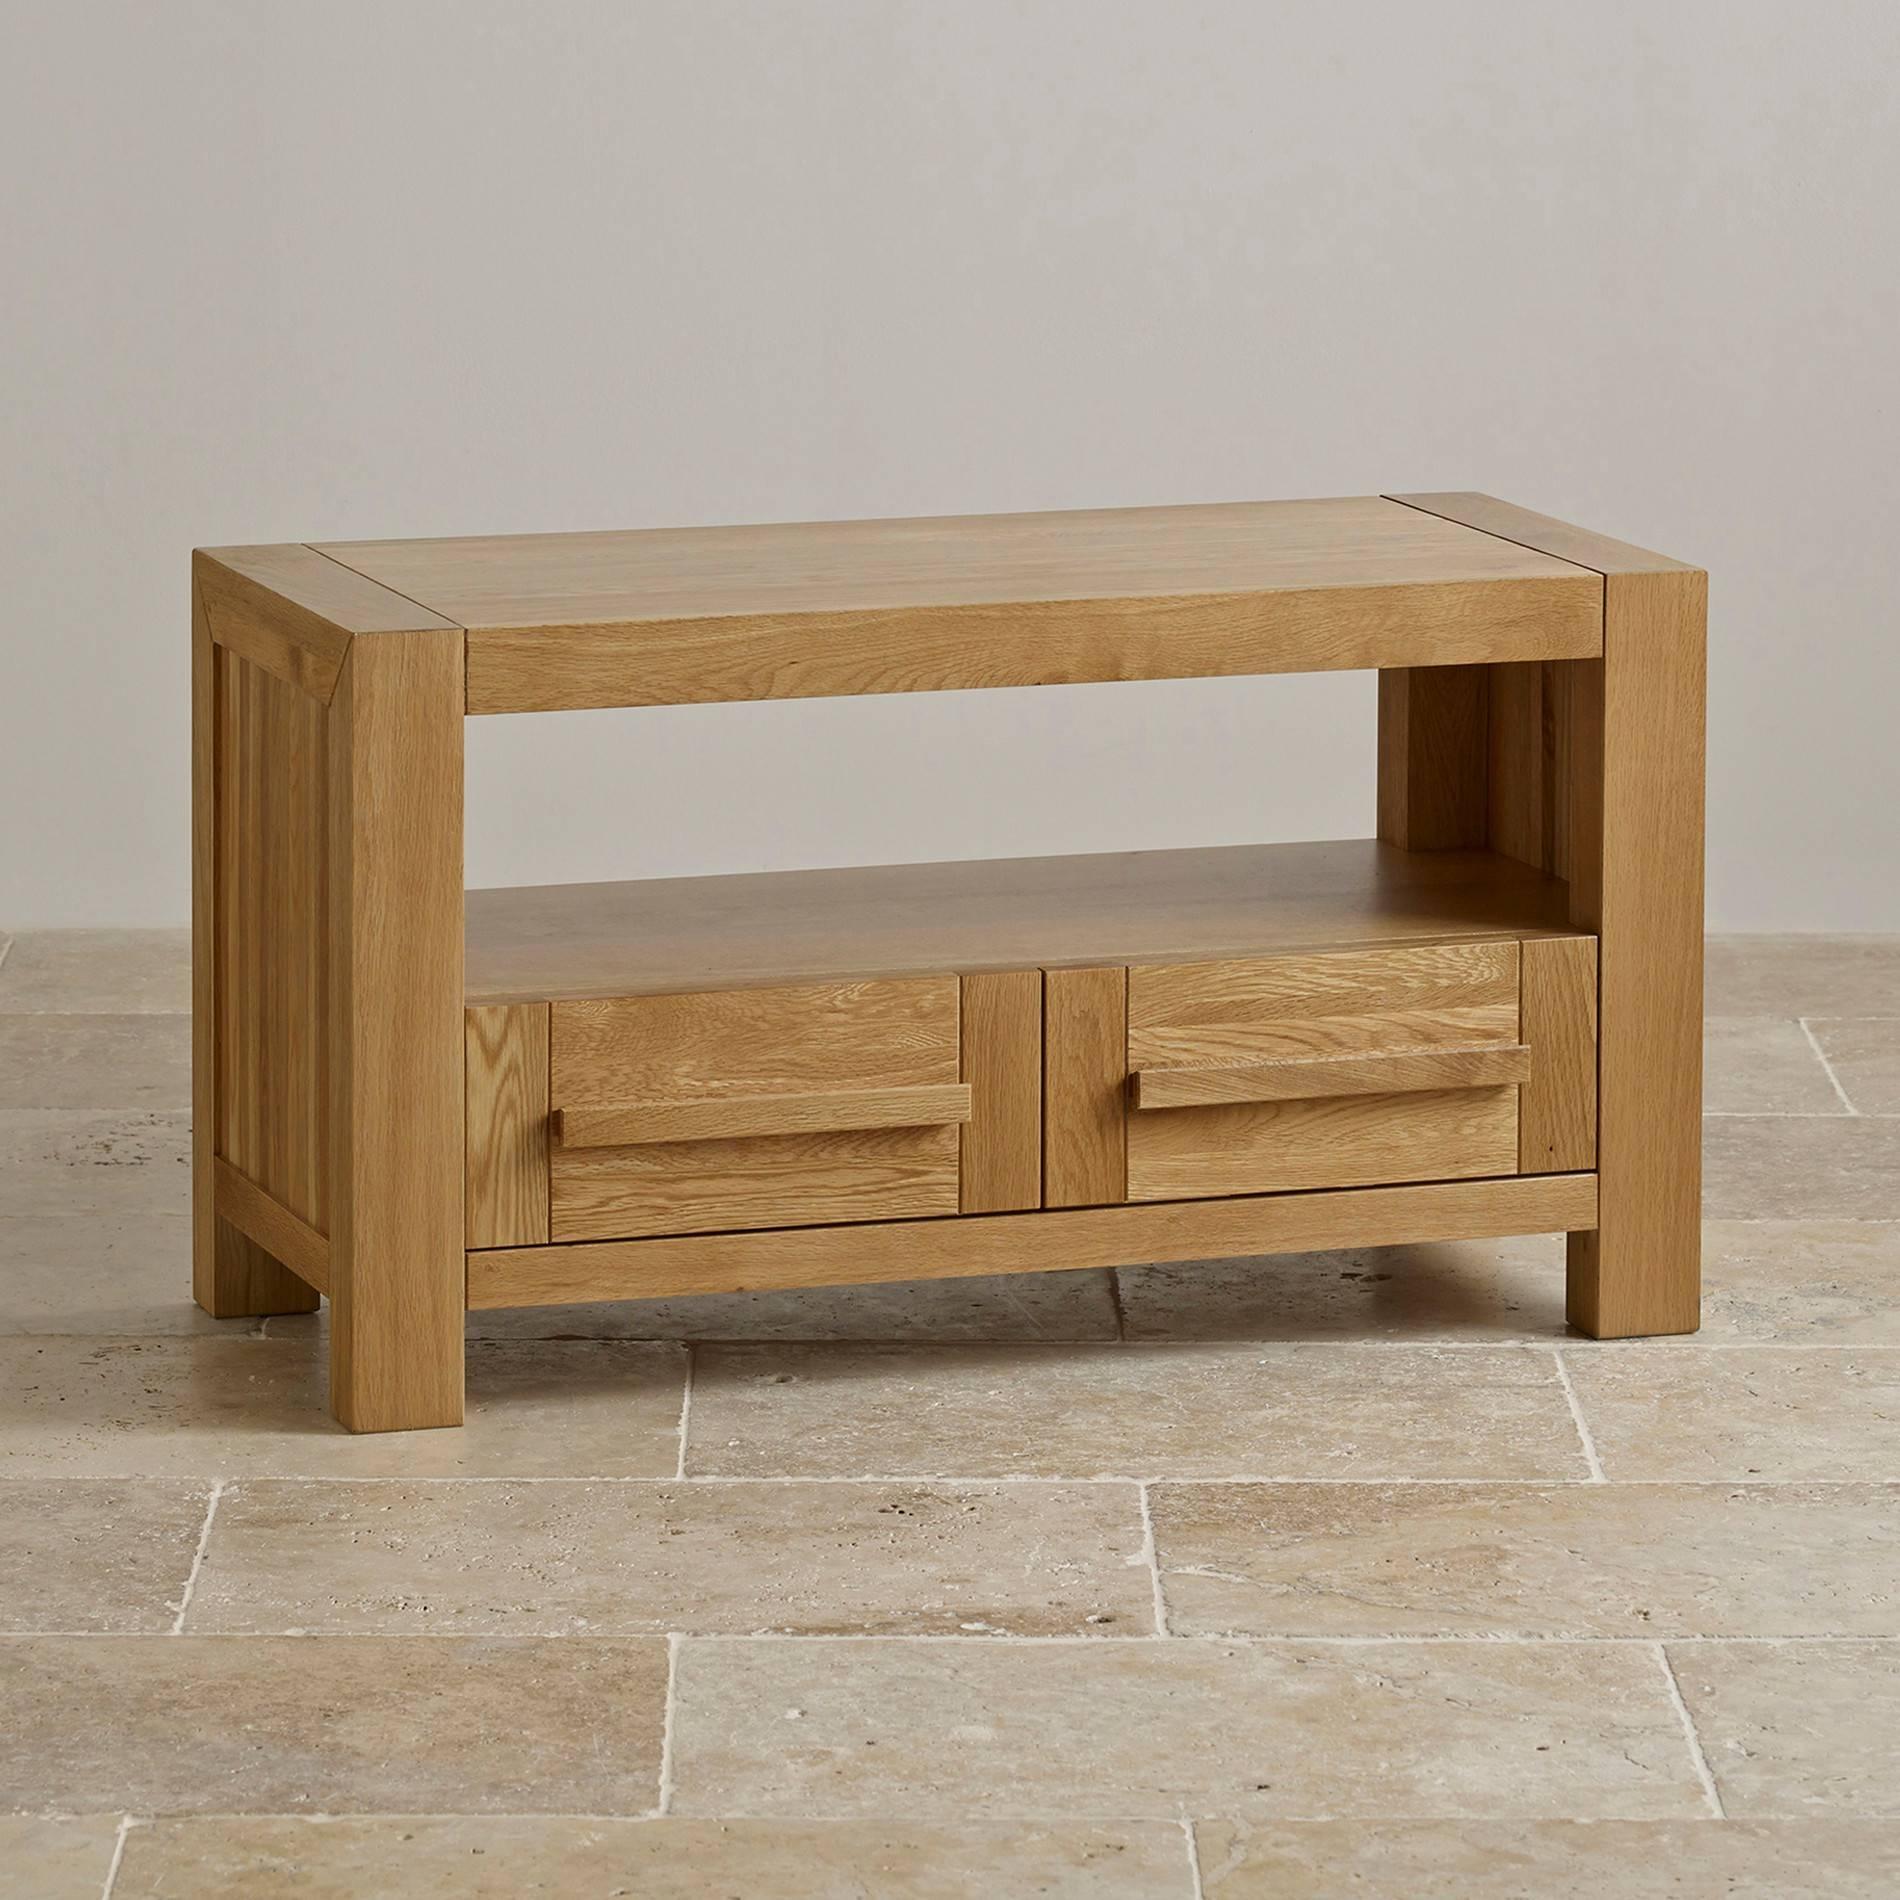 Fresco 2 Drawer Tv Cabinet In Solid Oak | Oak Furniture Land regarding Tv Stands in Oak (Image 3 of 15)